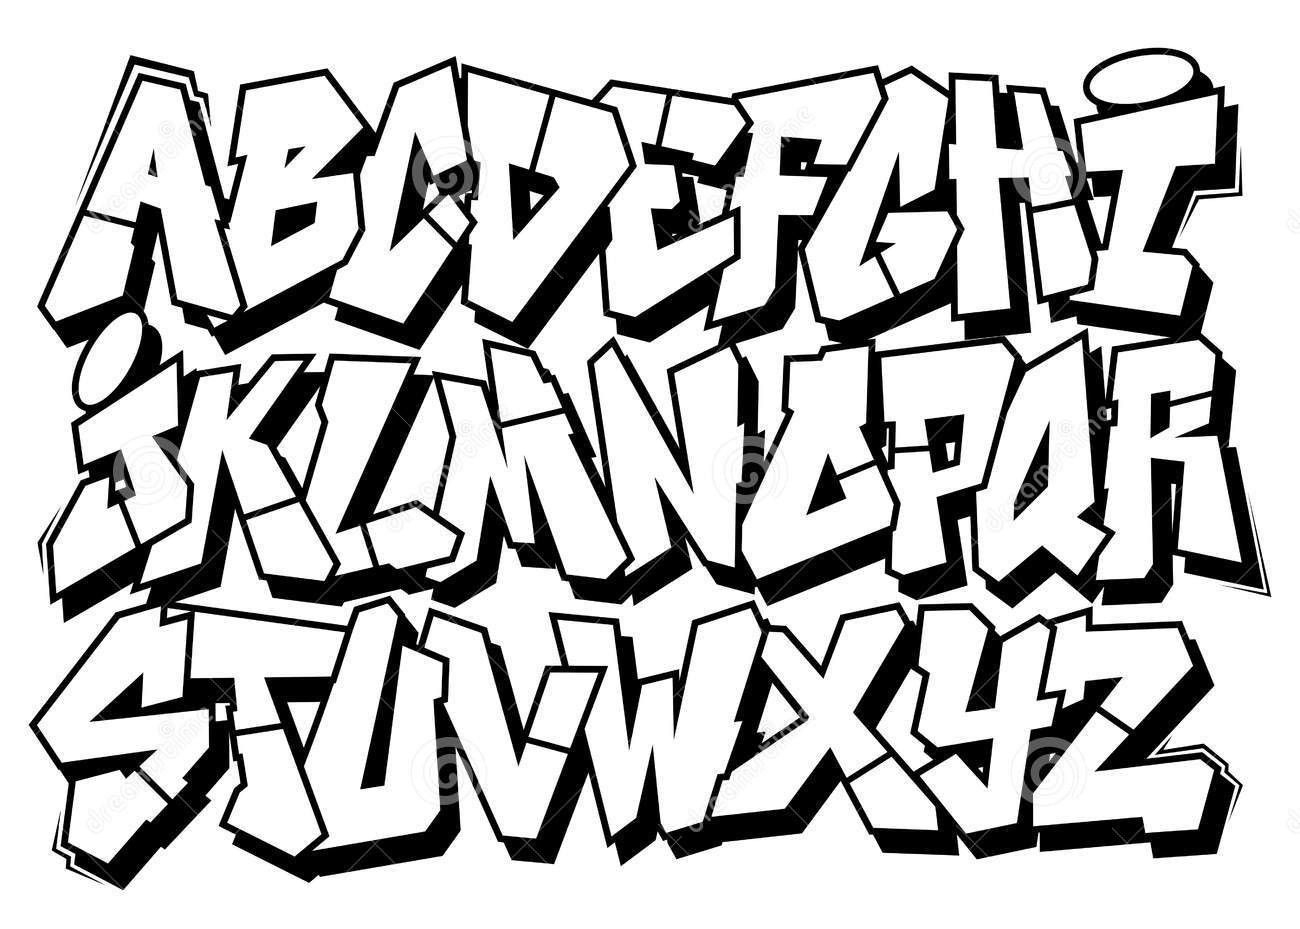 Pin Von Graffitibigg Auf Graffiti Schrift | Graffiti bei Graffiti Alphabet Lernen